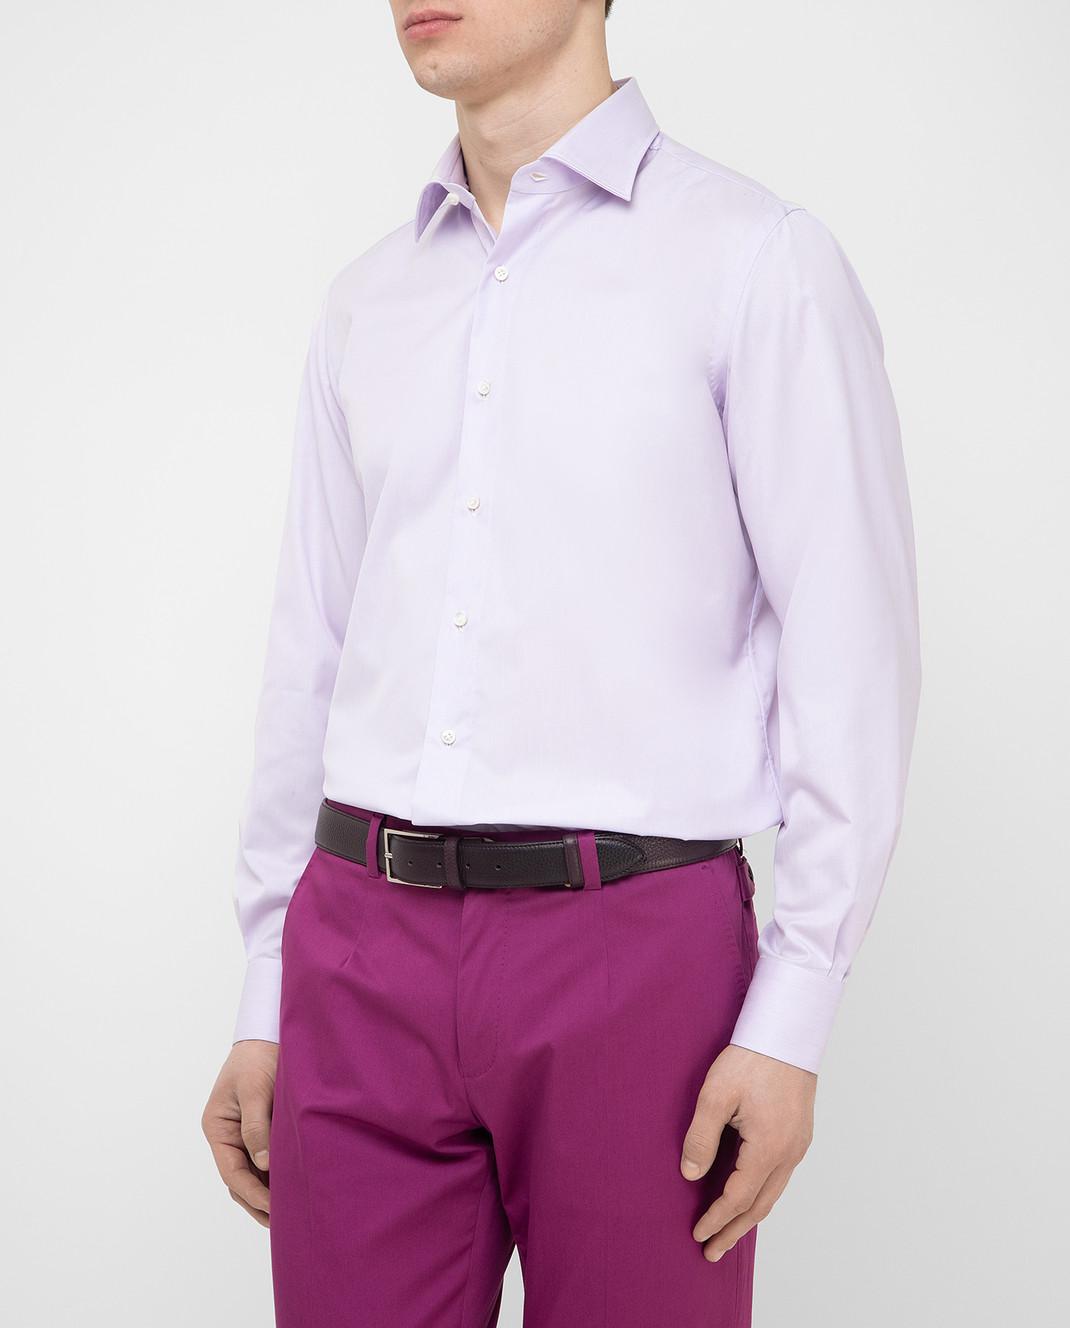 Luciano Lombardi Сиреневая рубашка 4653085 изображение 3